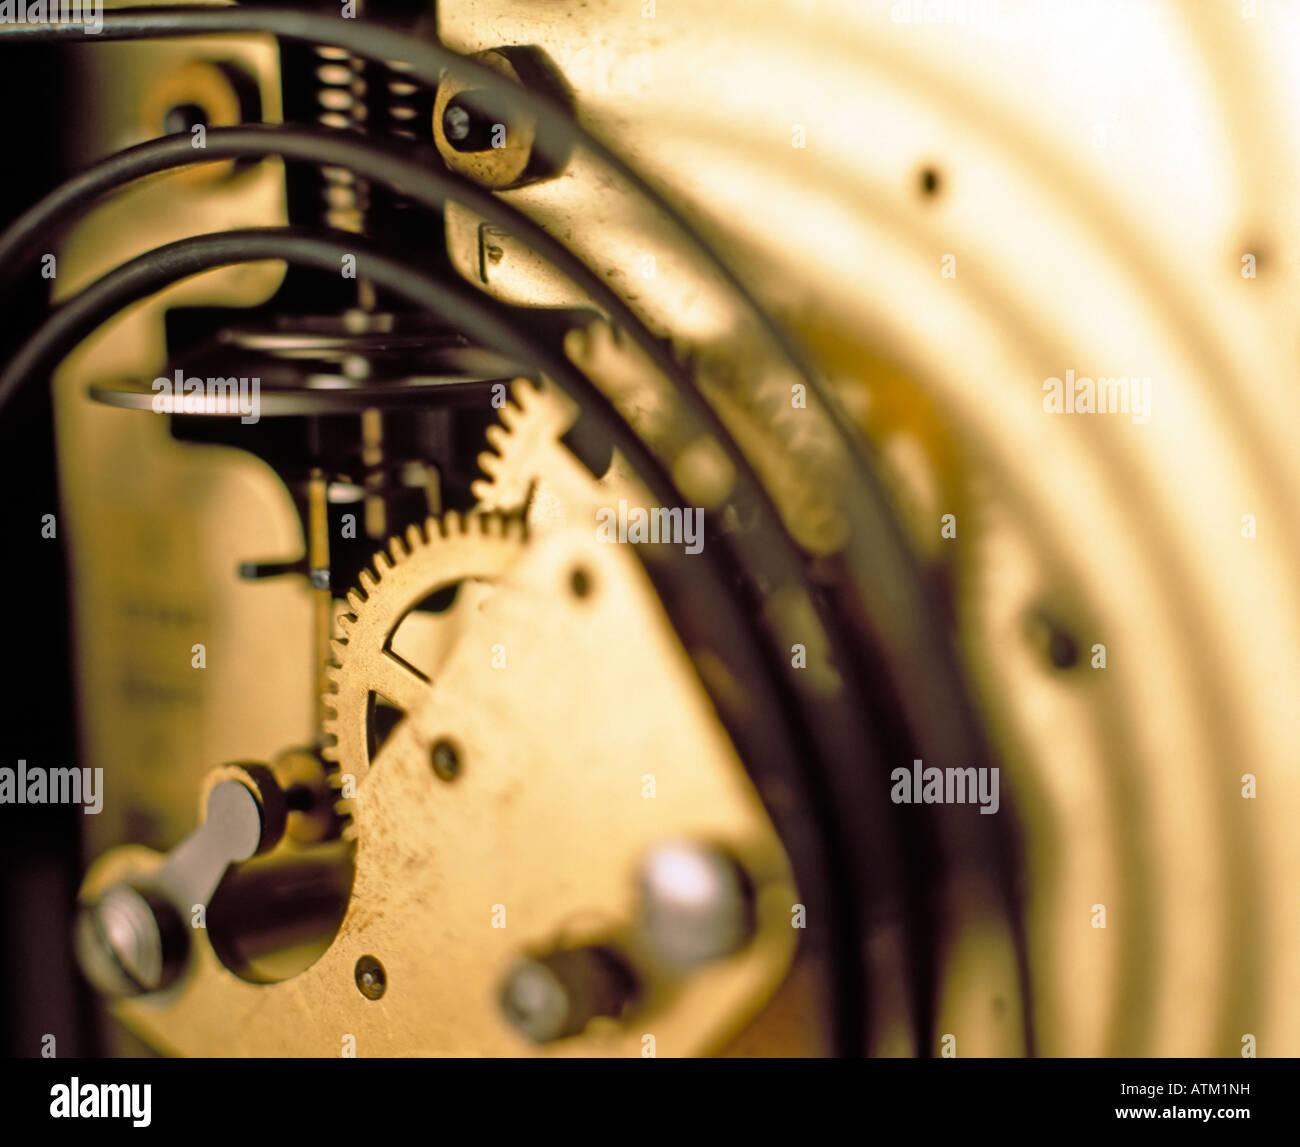 Clockwork - Stock Image